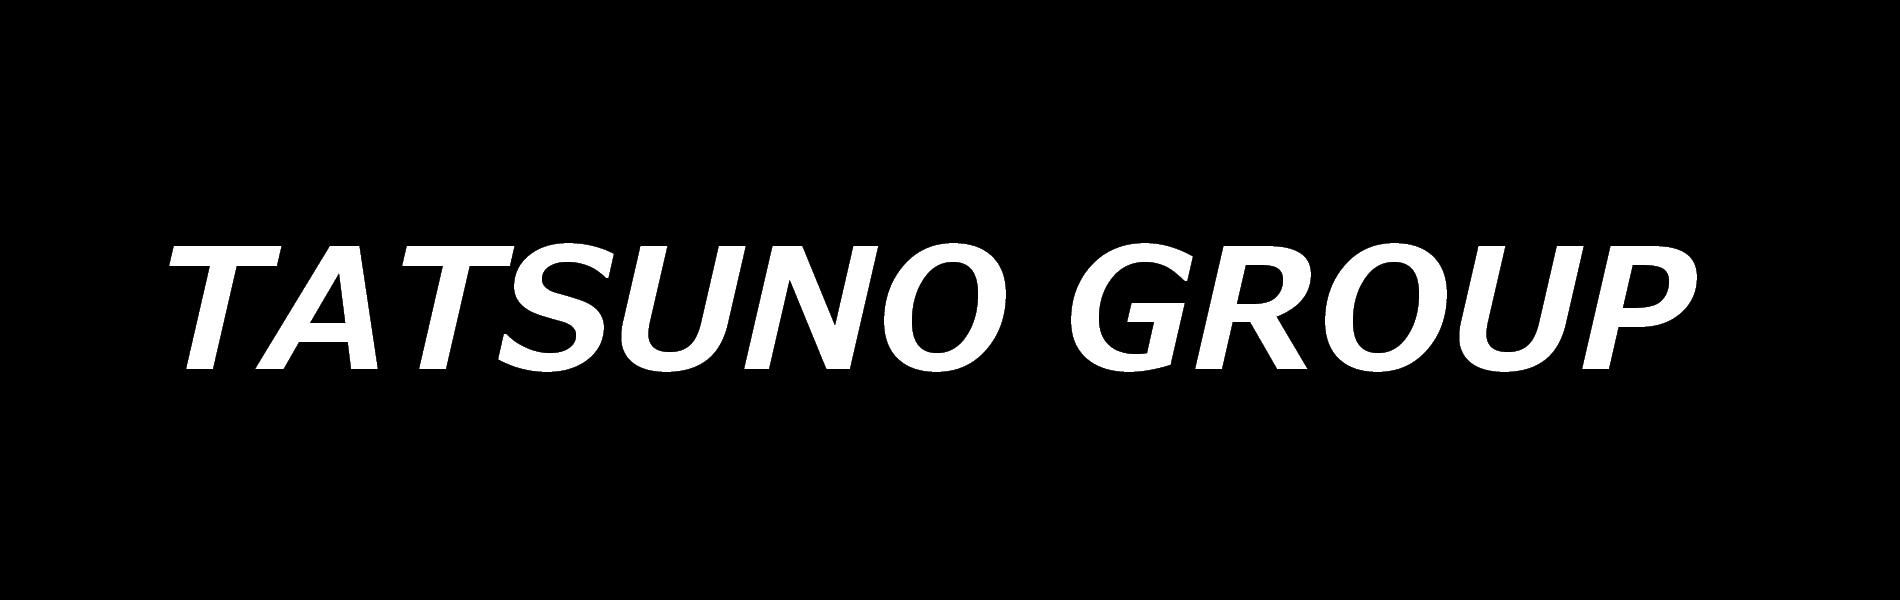 TATSUNO GROUP